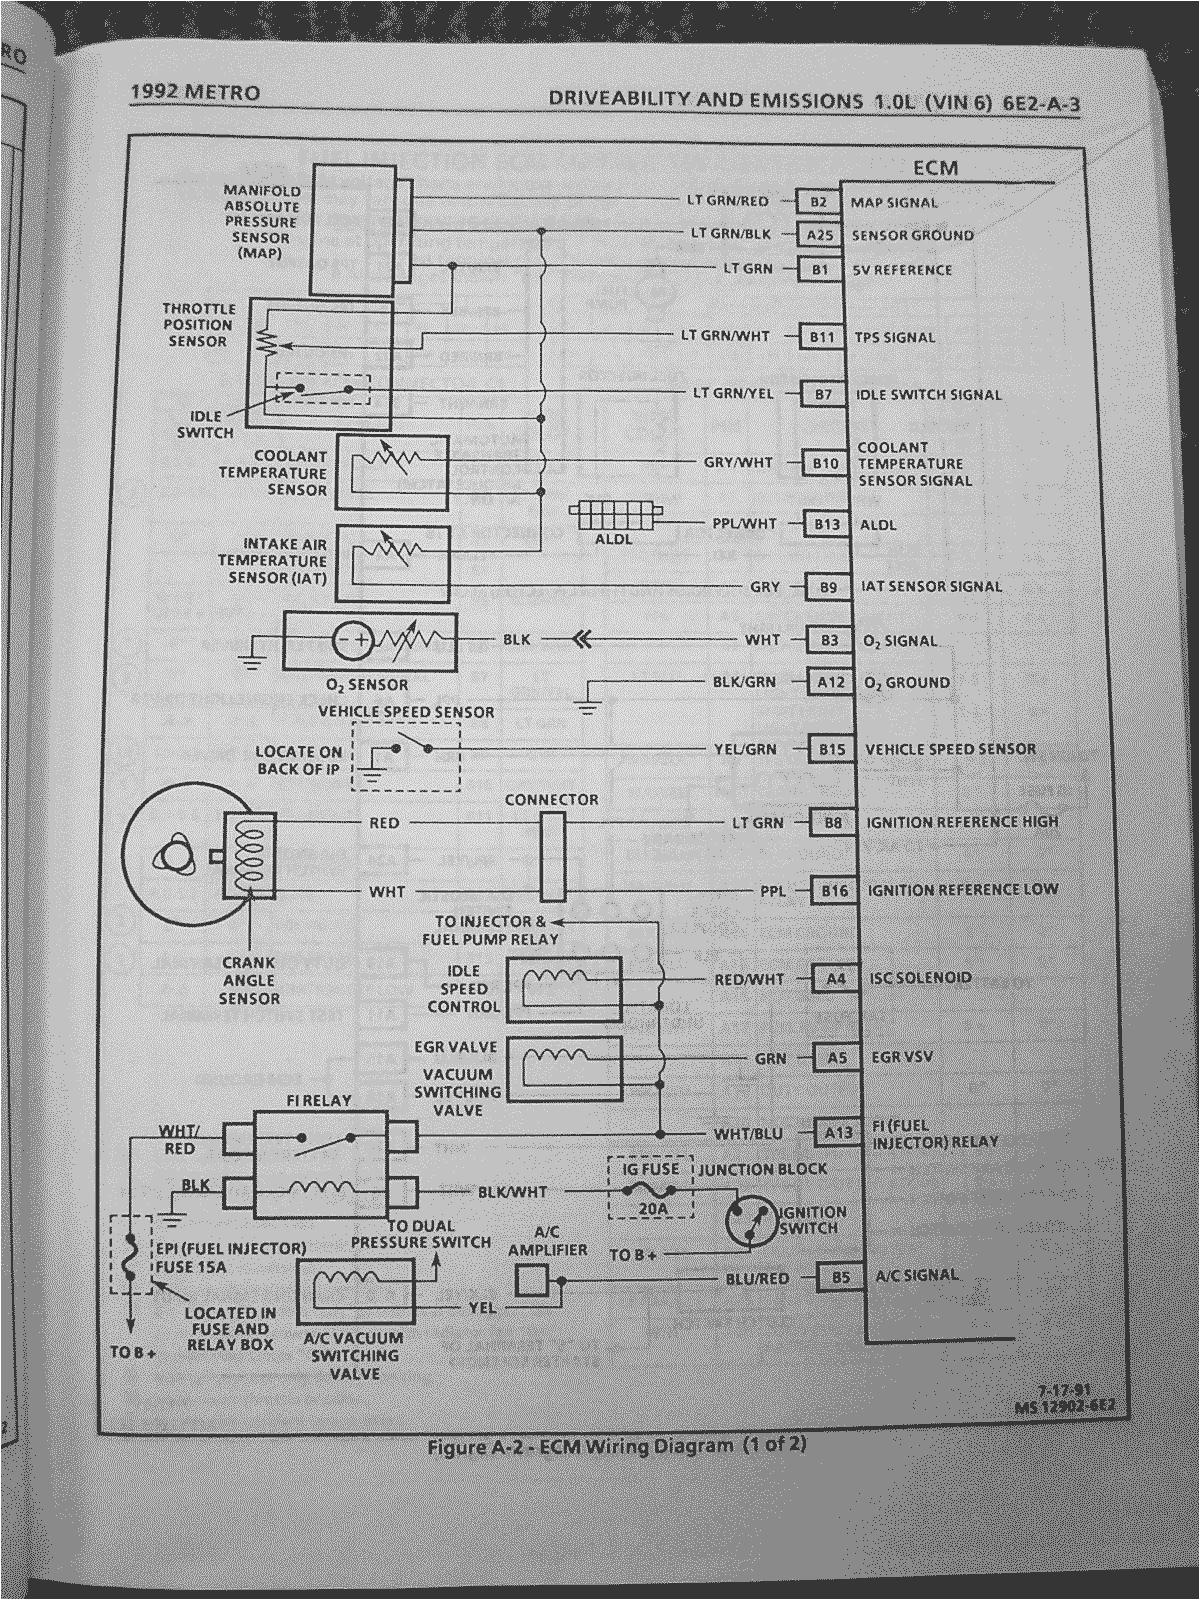 geo metro wire diagram database wiring diagramgeo metro and suzuki swift wiring diagrams metroxfi com 1998